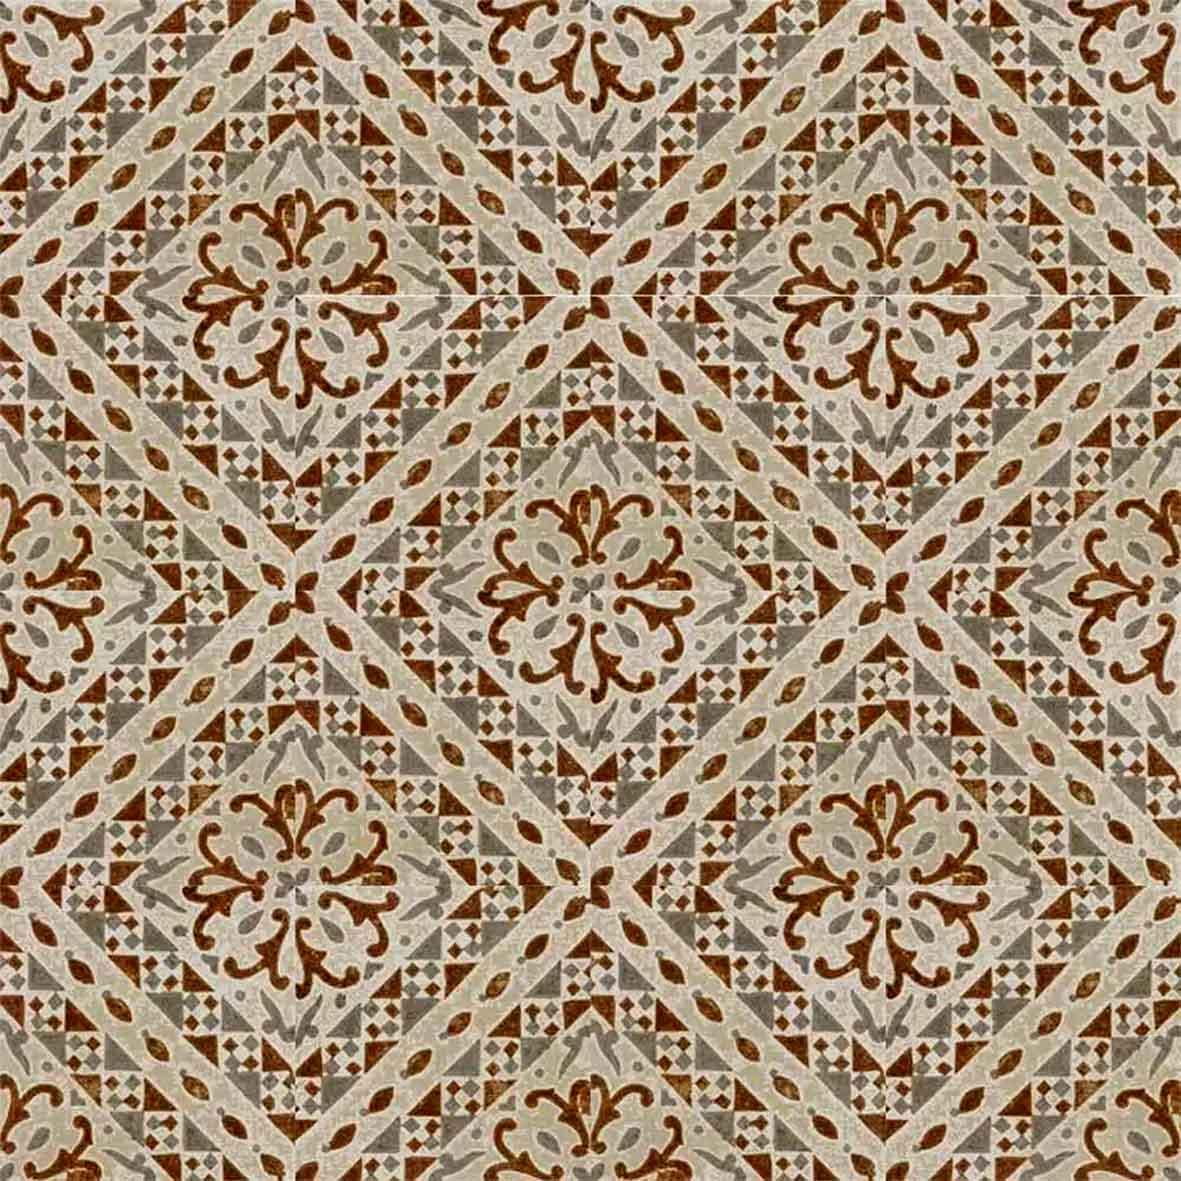 Adesivo para Azulejo Ladrilho Hidráulico Guadalupe Vinil 15x15cm 16 peças Cosi Dimora